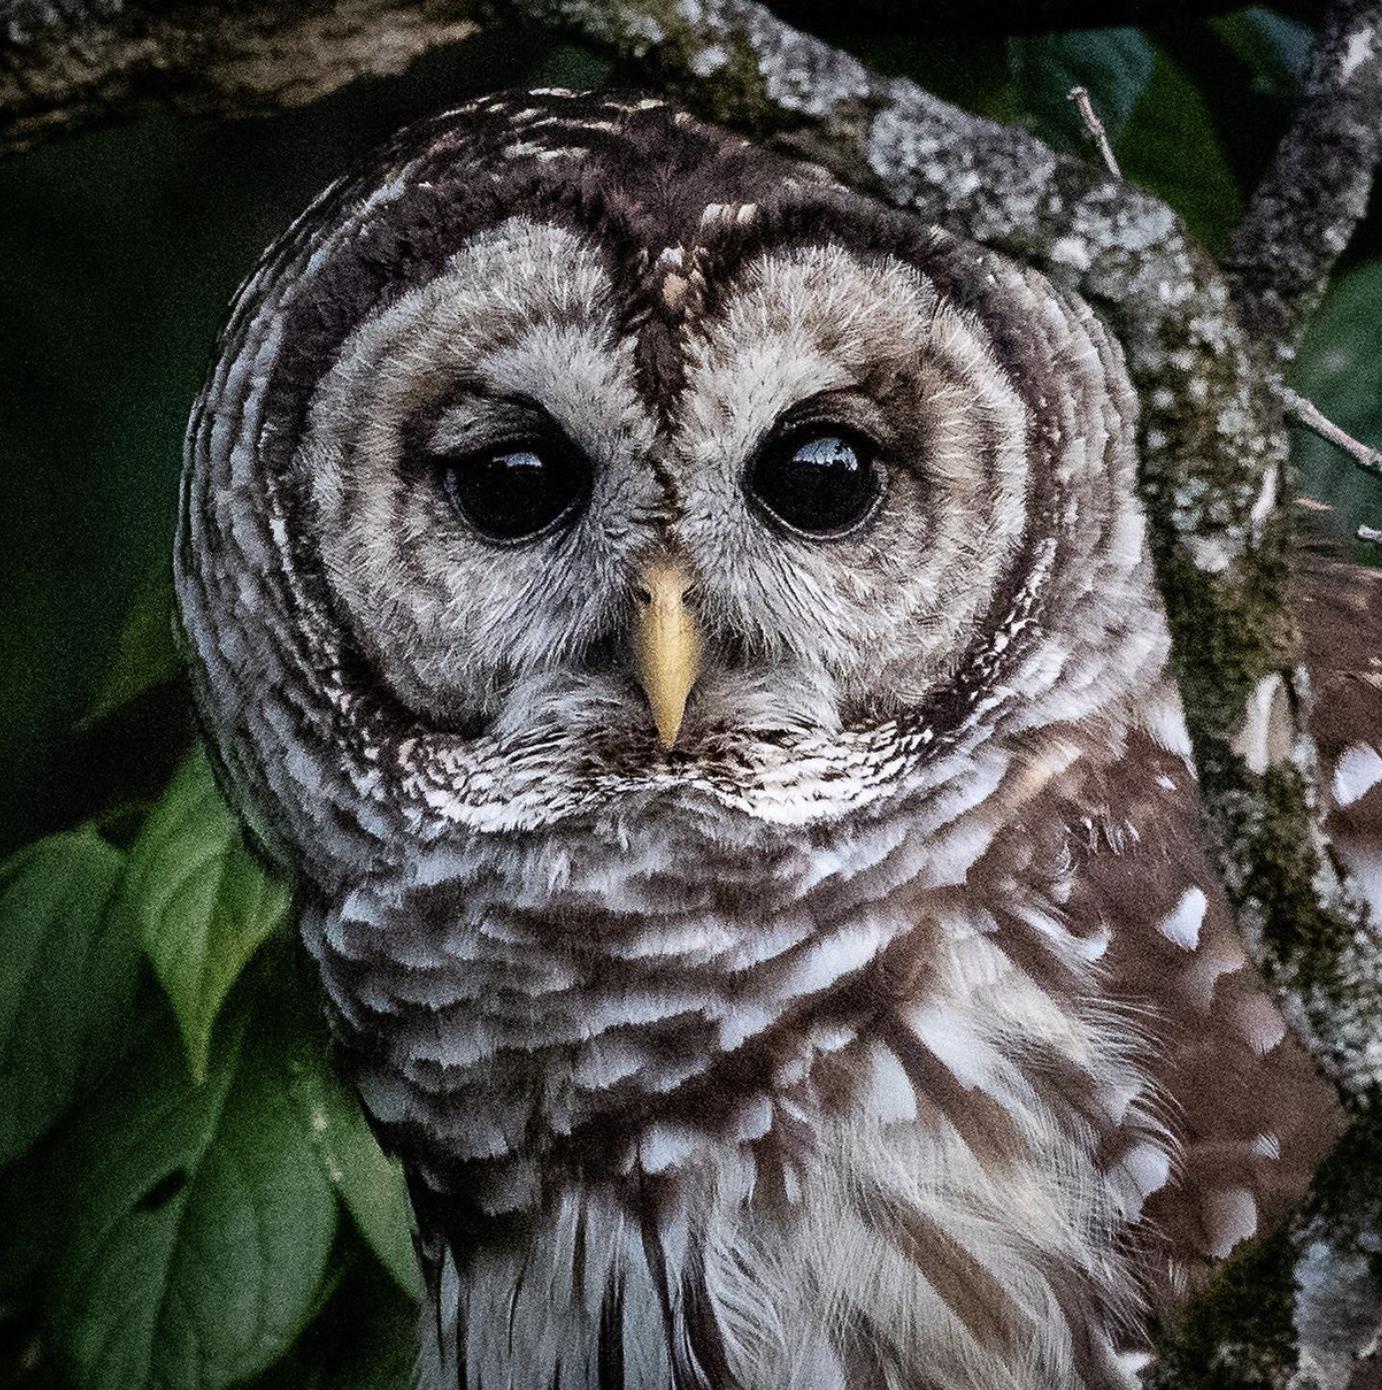 A Barred Owl ( Strix varia ) at Blue Heron captured by  Jeff Kingsfield .